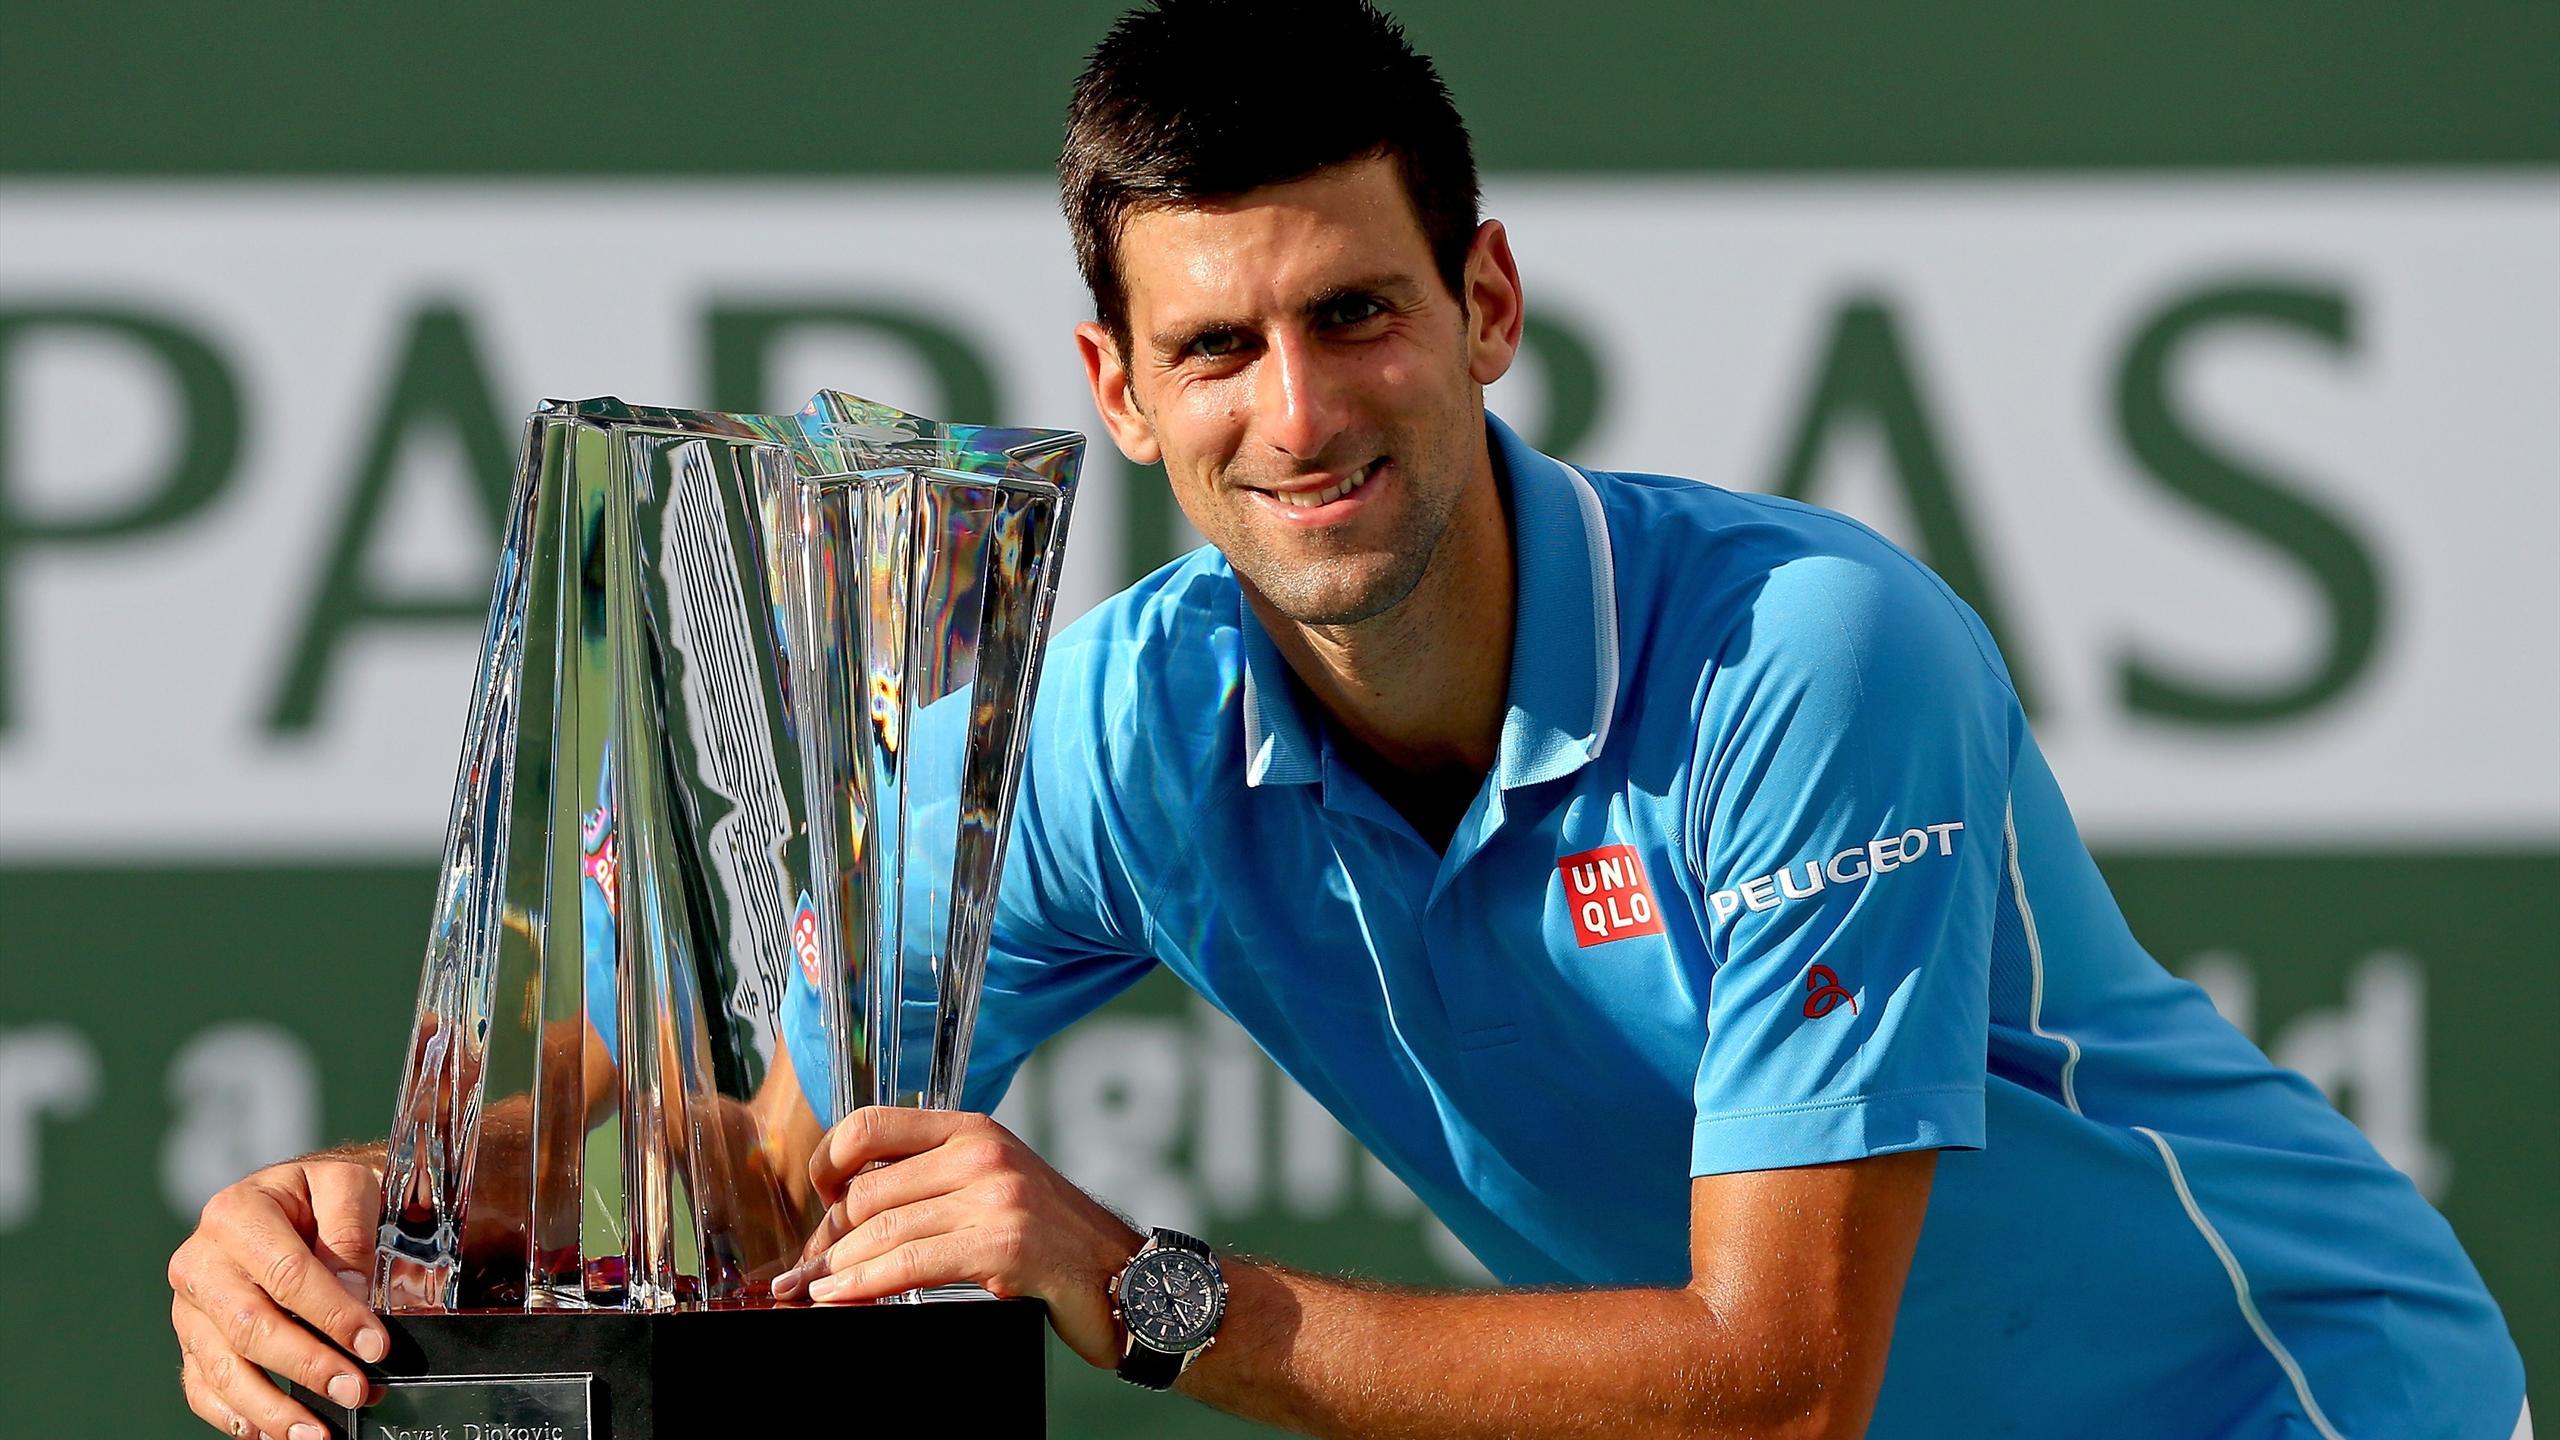 Novak Djokovic winner of Indian Wells Masters 1000 in 2015